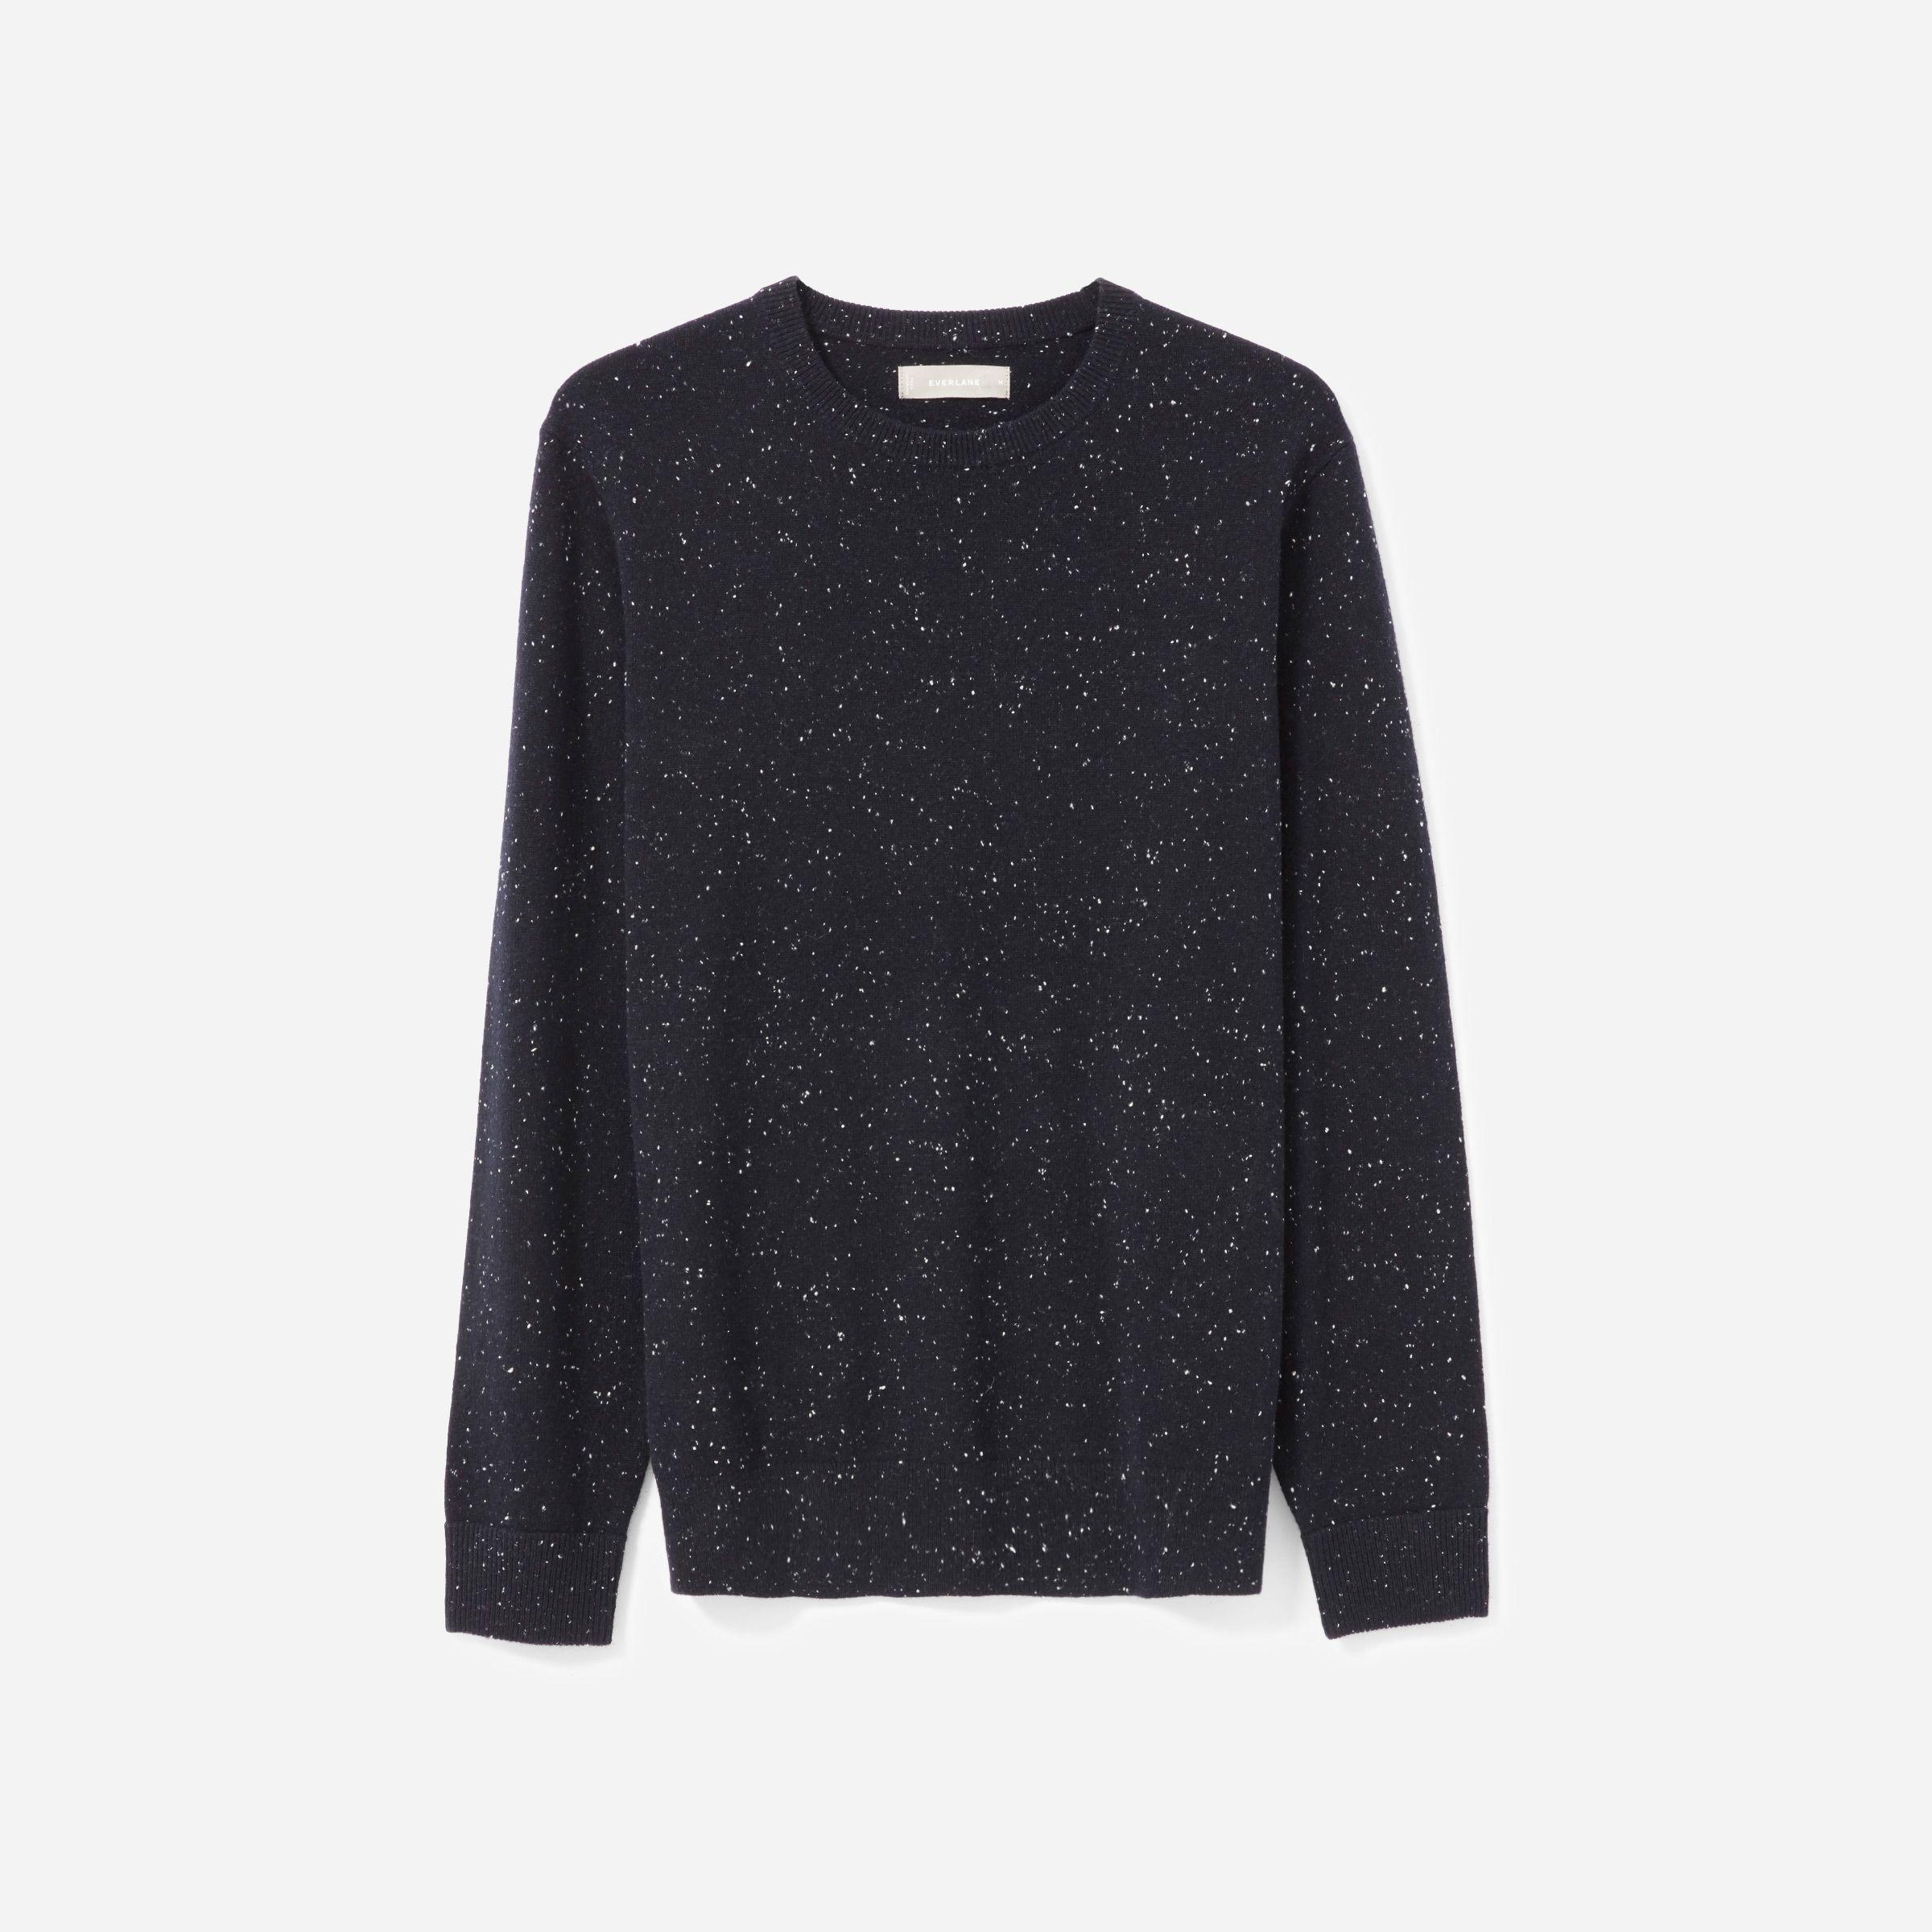 10 Winter Sweaters for Men 2019 The Best Cozy, Warm Sweaters